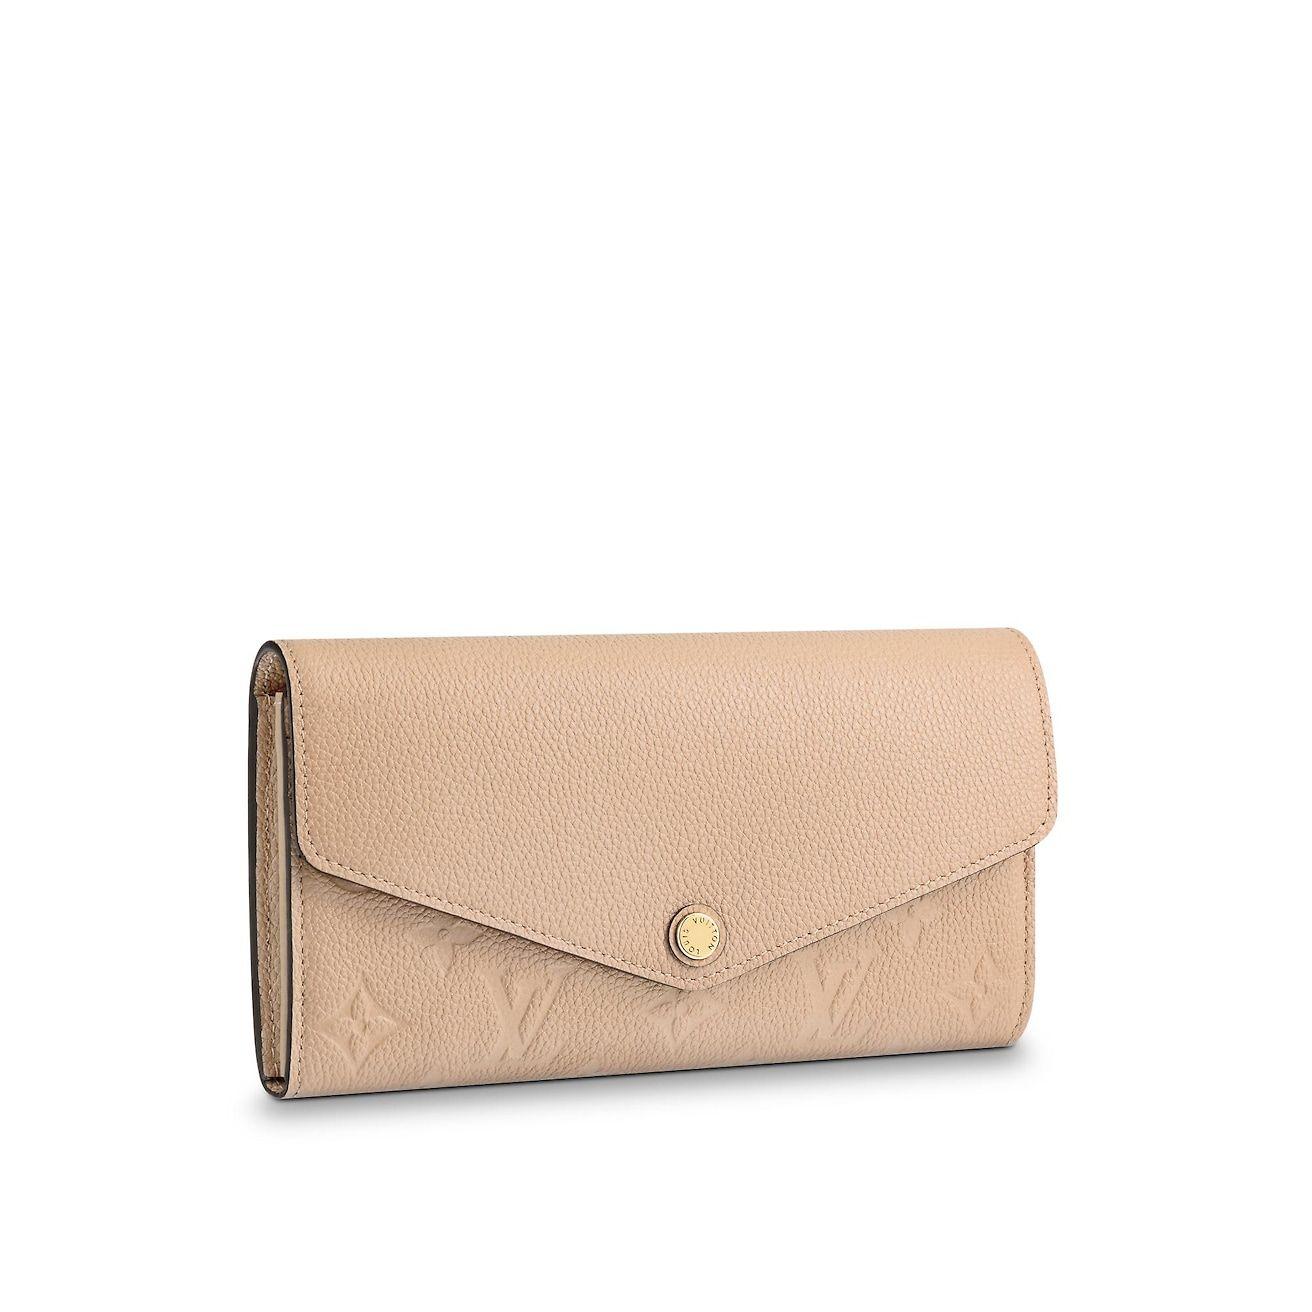 4f51042456bb View 1 - Monogram Empreinte Leather SMALL LEATHER GOODS Small Leather Goods  Sarah Wallet